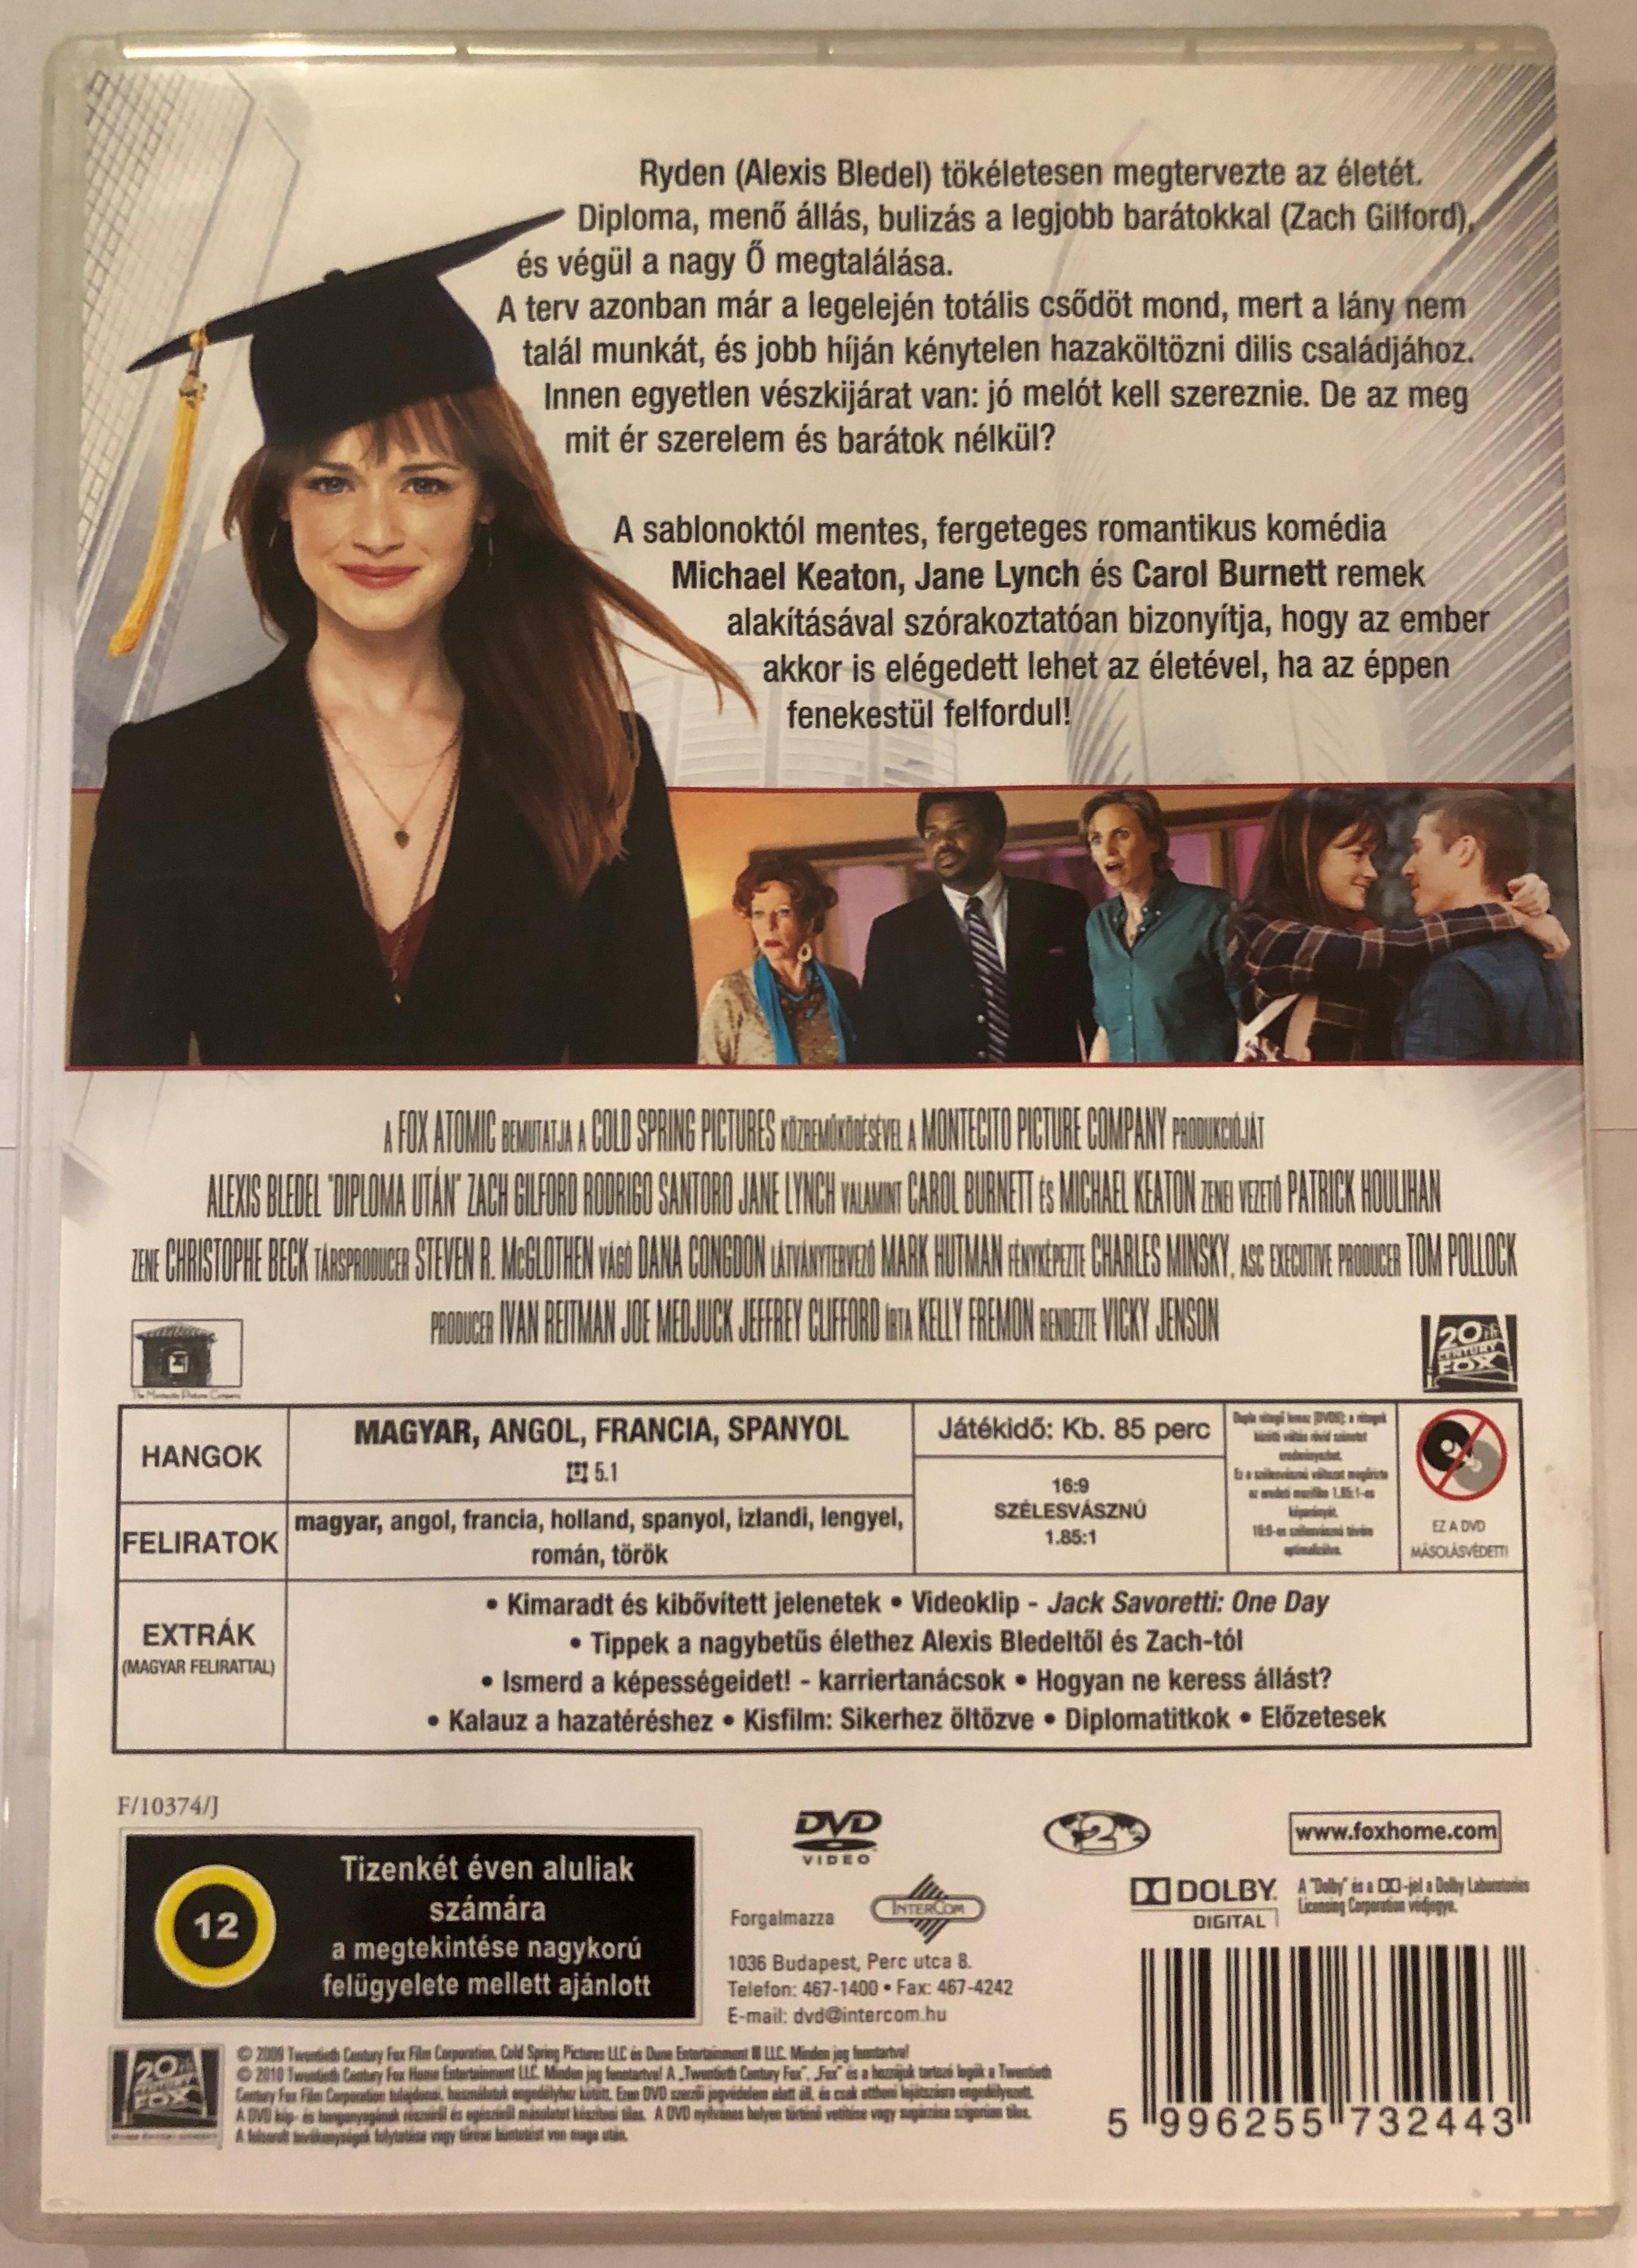 -post-grad-dvd-2009-diploma-ut-n-directed-by-vicky-jenson-2-.jpg